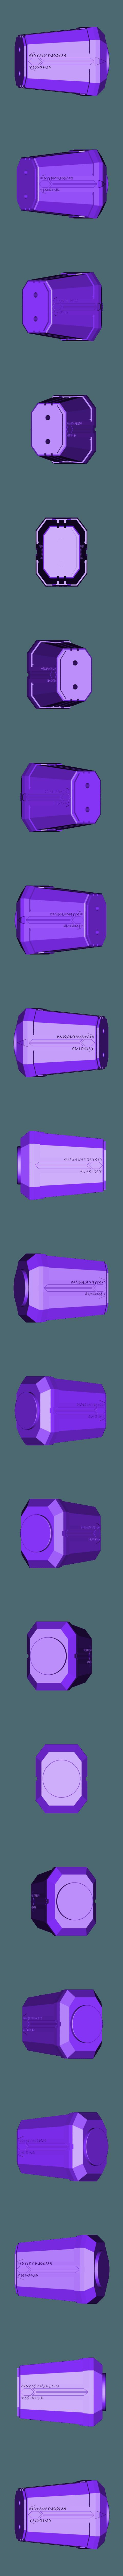 hammermk2.stl Download STL file Stormbreaker New Thor's Weapon from infinity war • 3D print model, MLBdesign